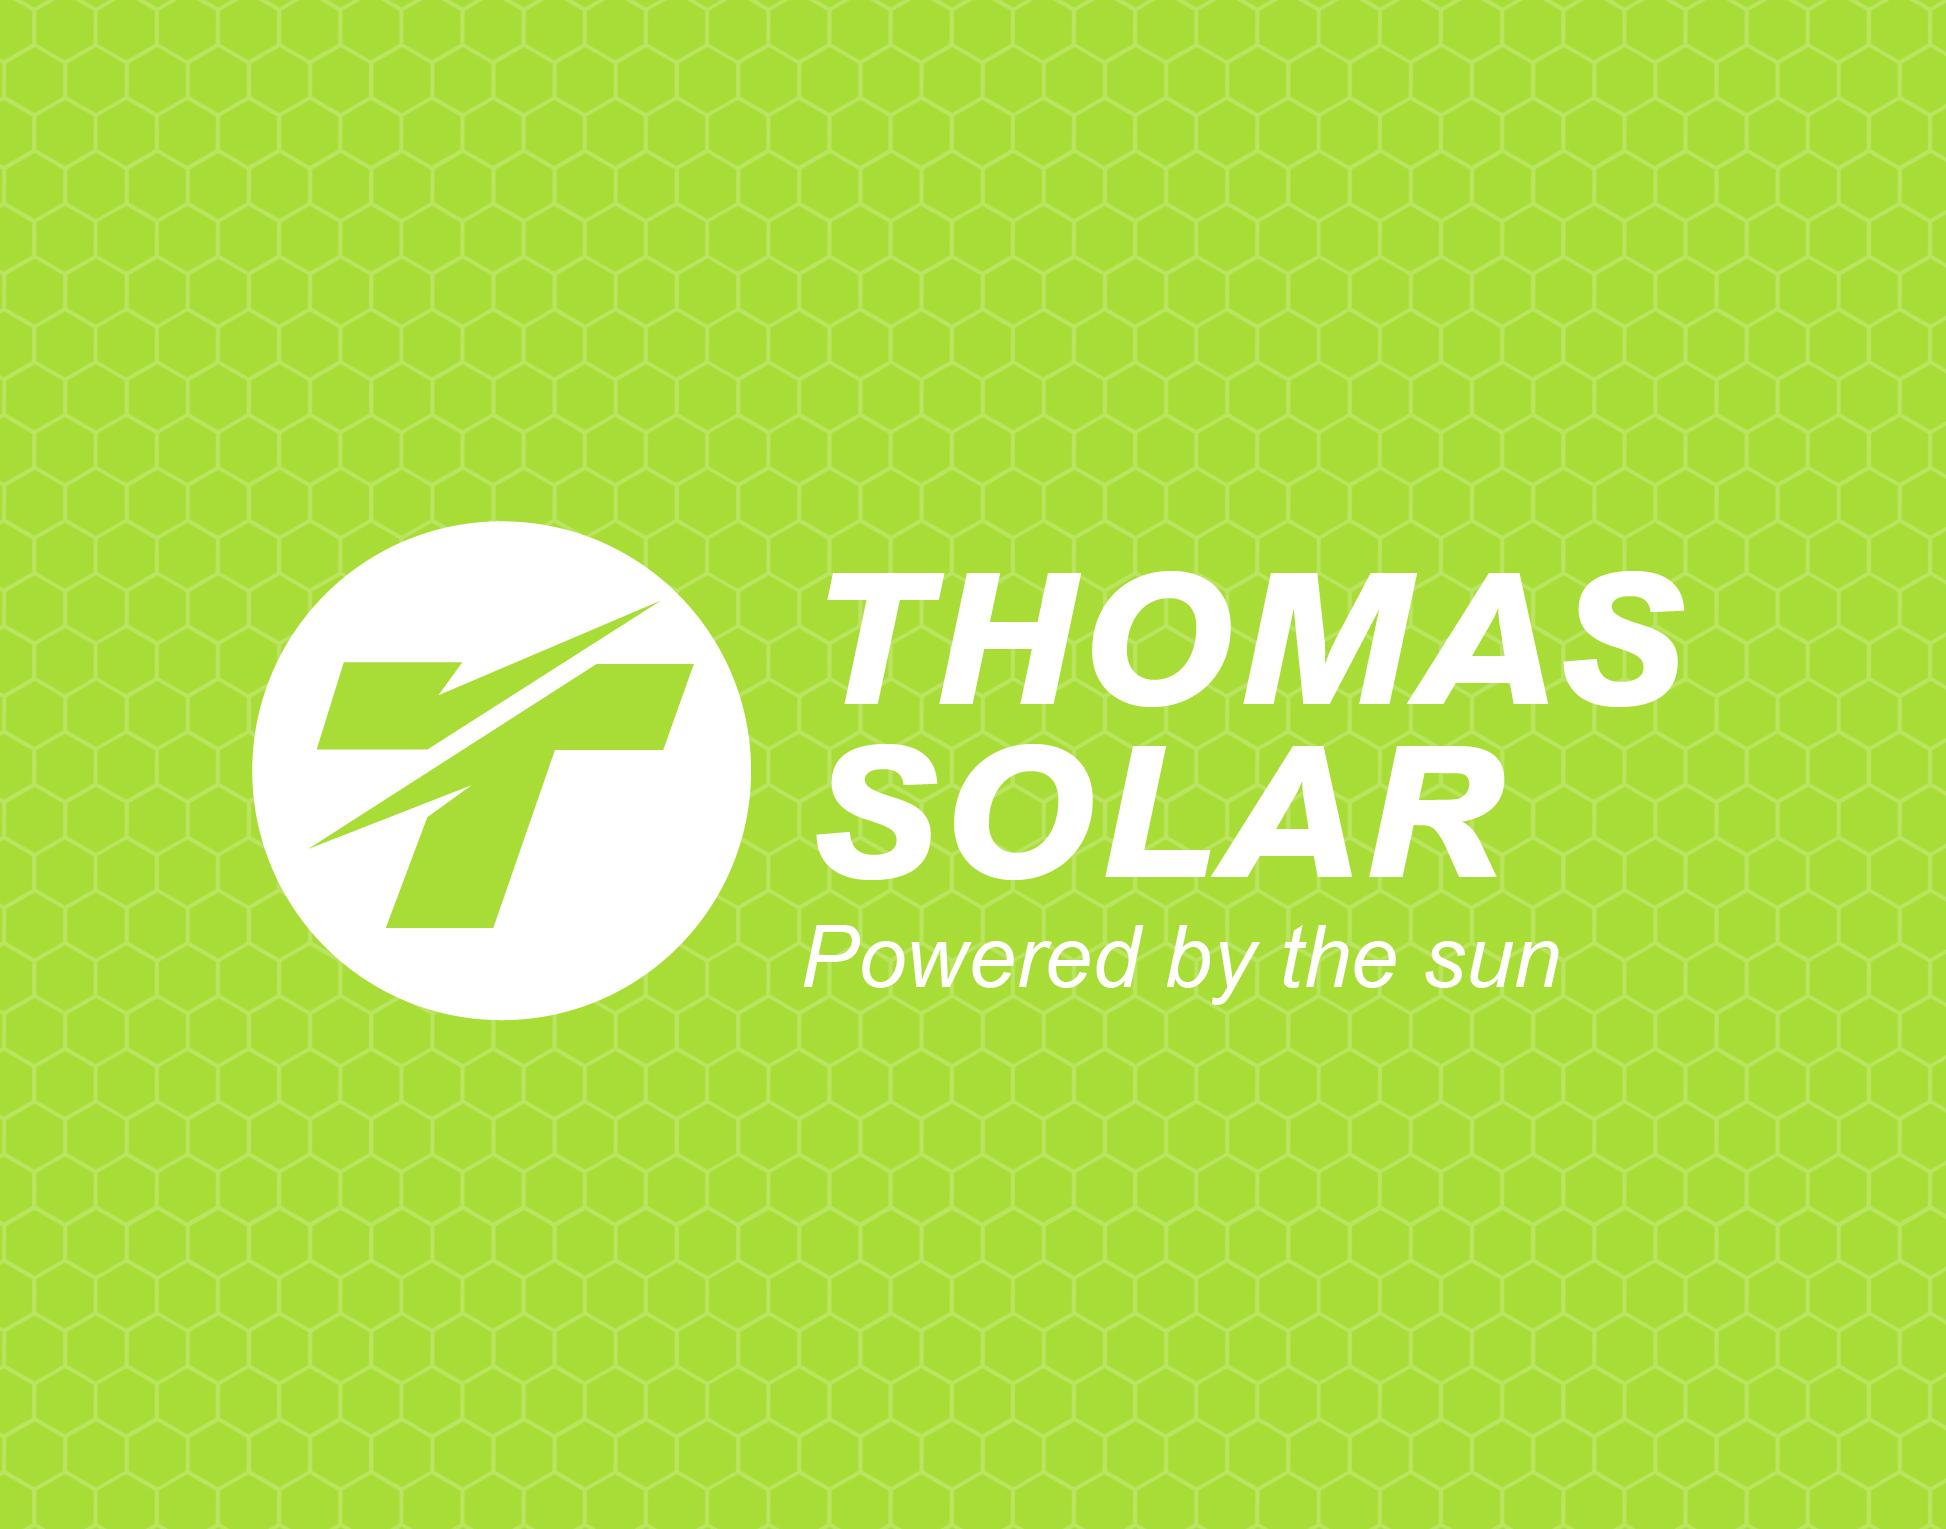 Thomas Solar